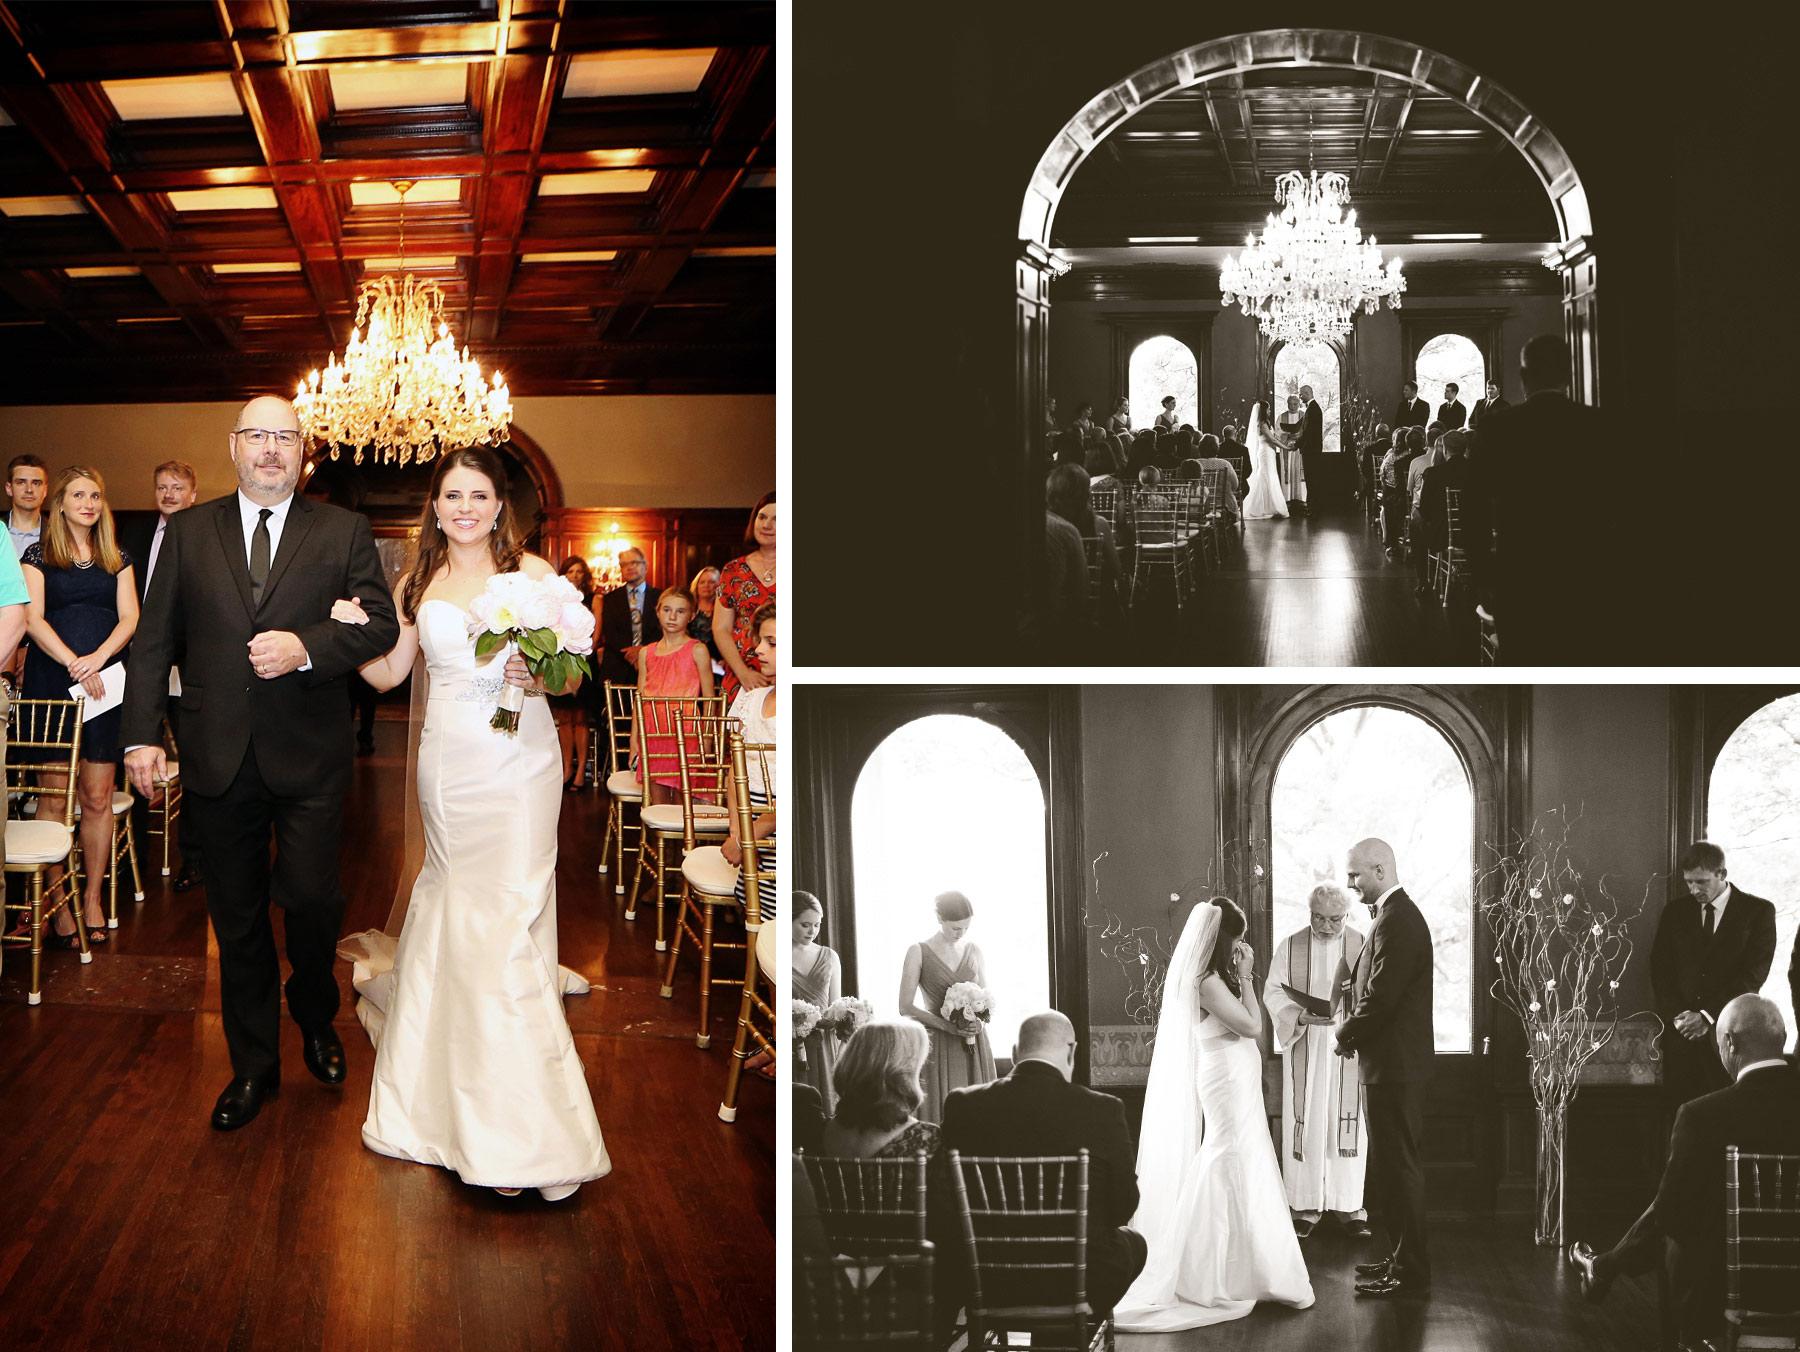 08-Minneapolis-Minnesota-Wedding-Photography-by-Vick-Photography-Semple-Ceremony-Mansion-Nikki-and-Matt.jpg